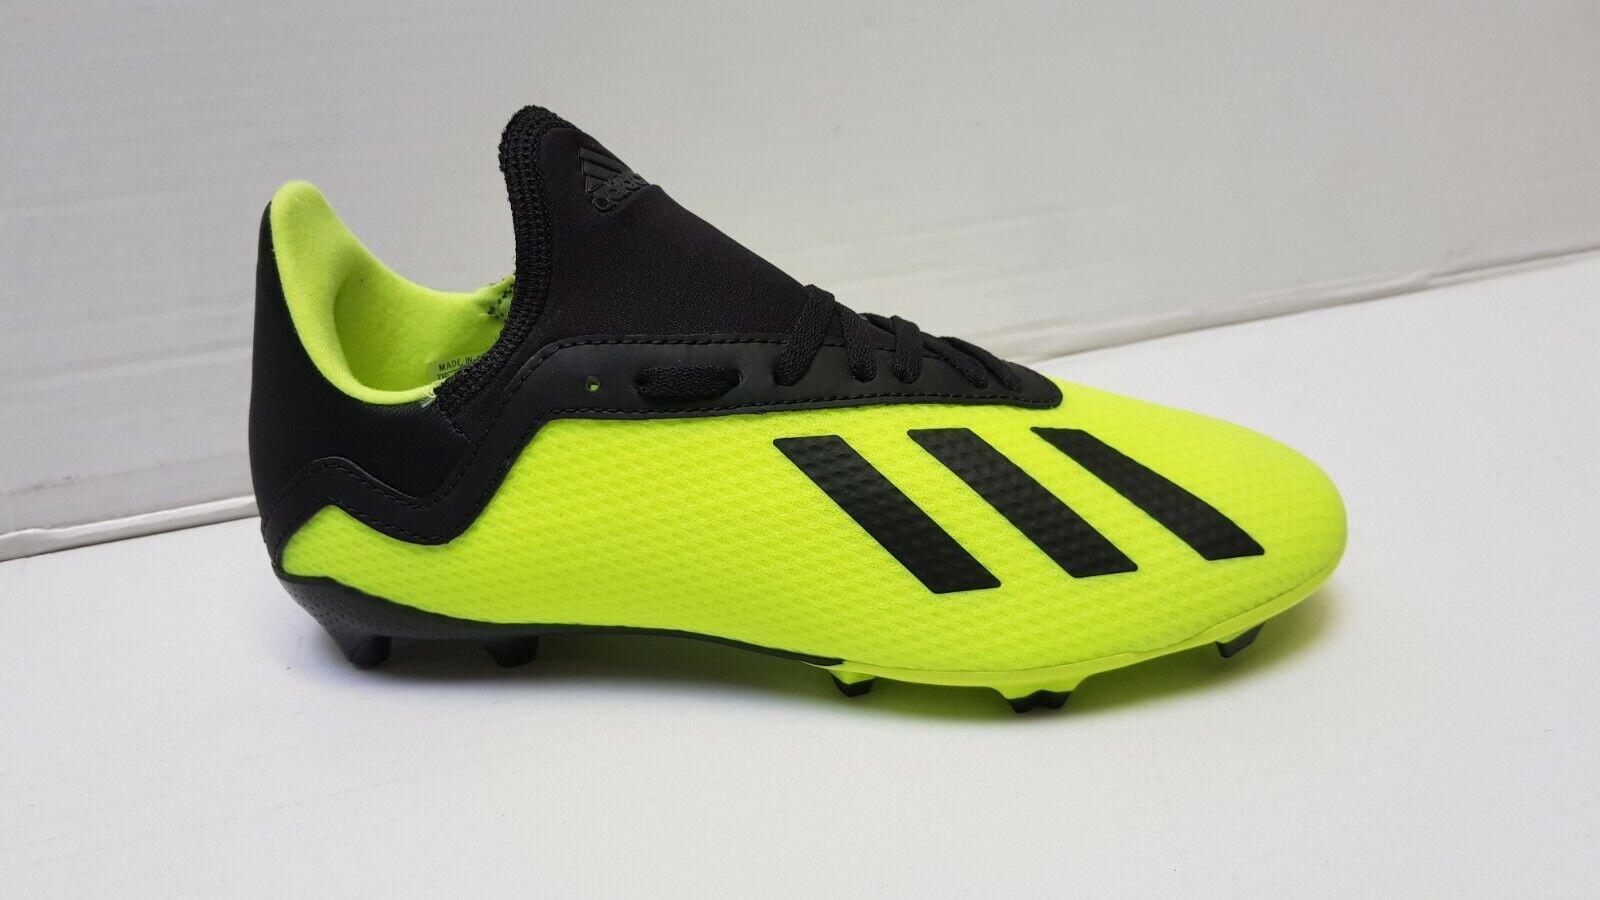 adidas Kinder Fussballschuhe X 18.3 FG J Kunstrasen Nocken Wiese  36 37 38 NEU